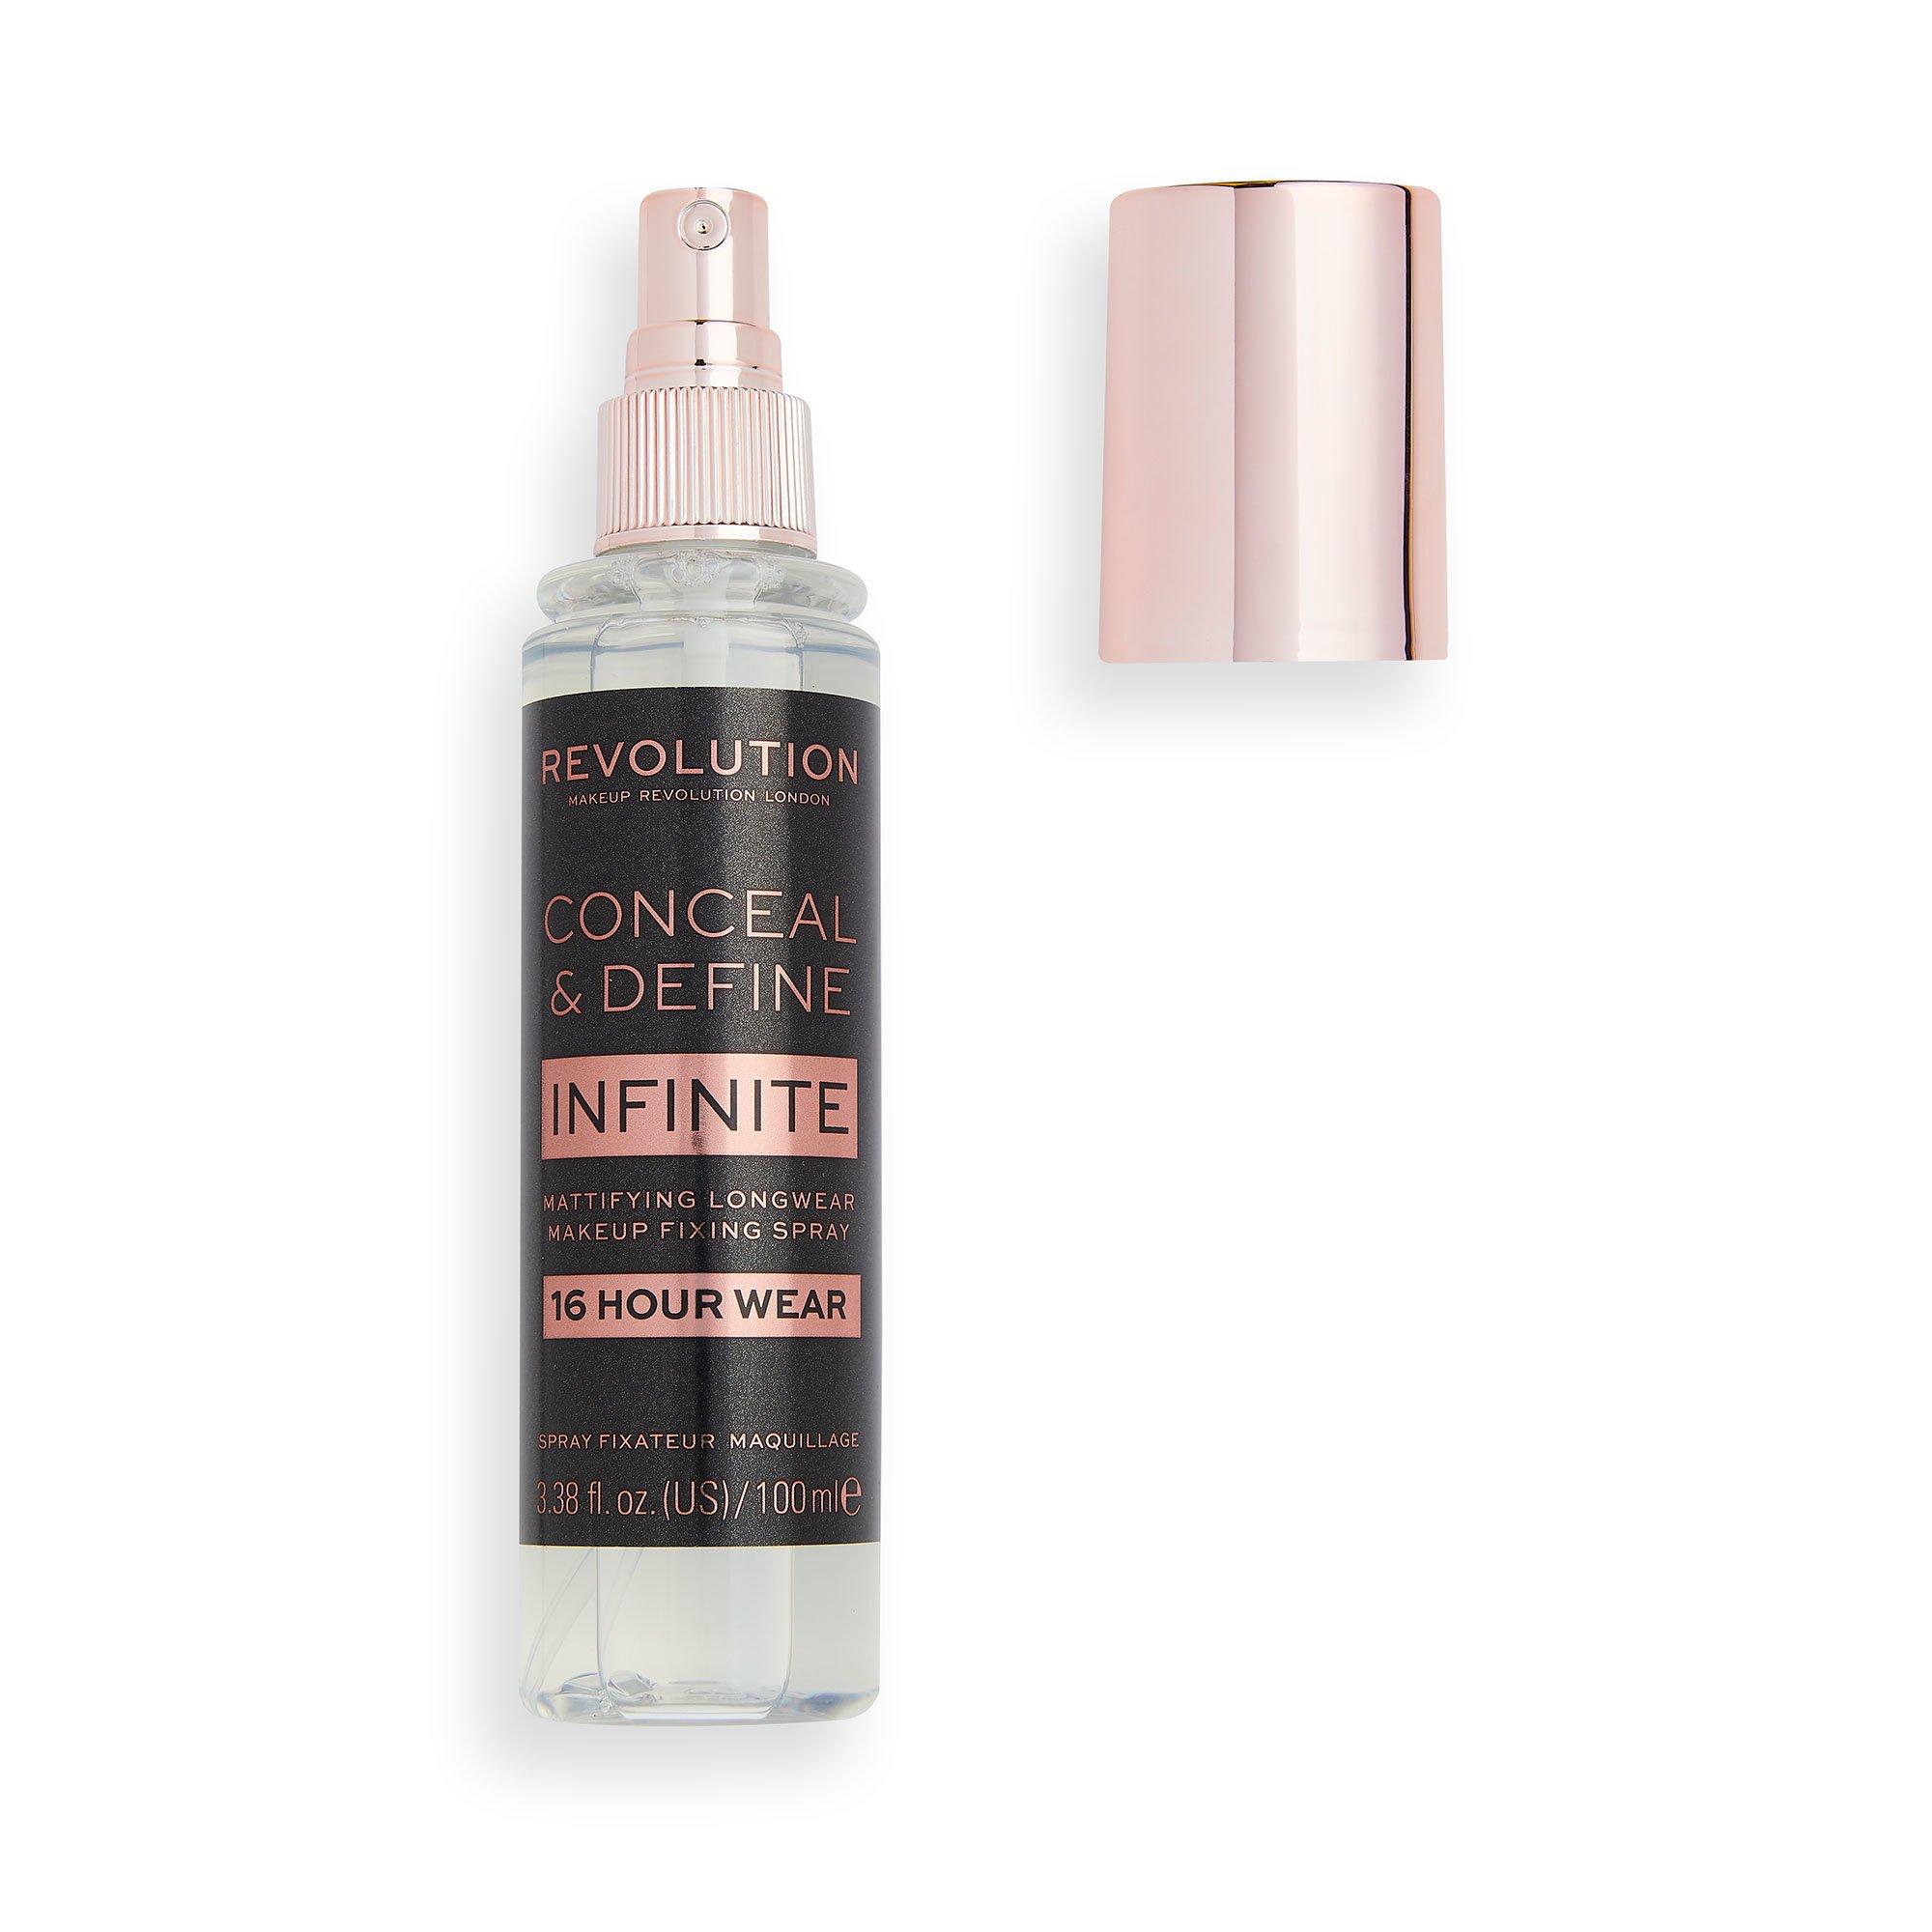 Makeup Revolution Conceal & Define Infinite Setting Spray